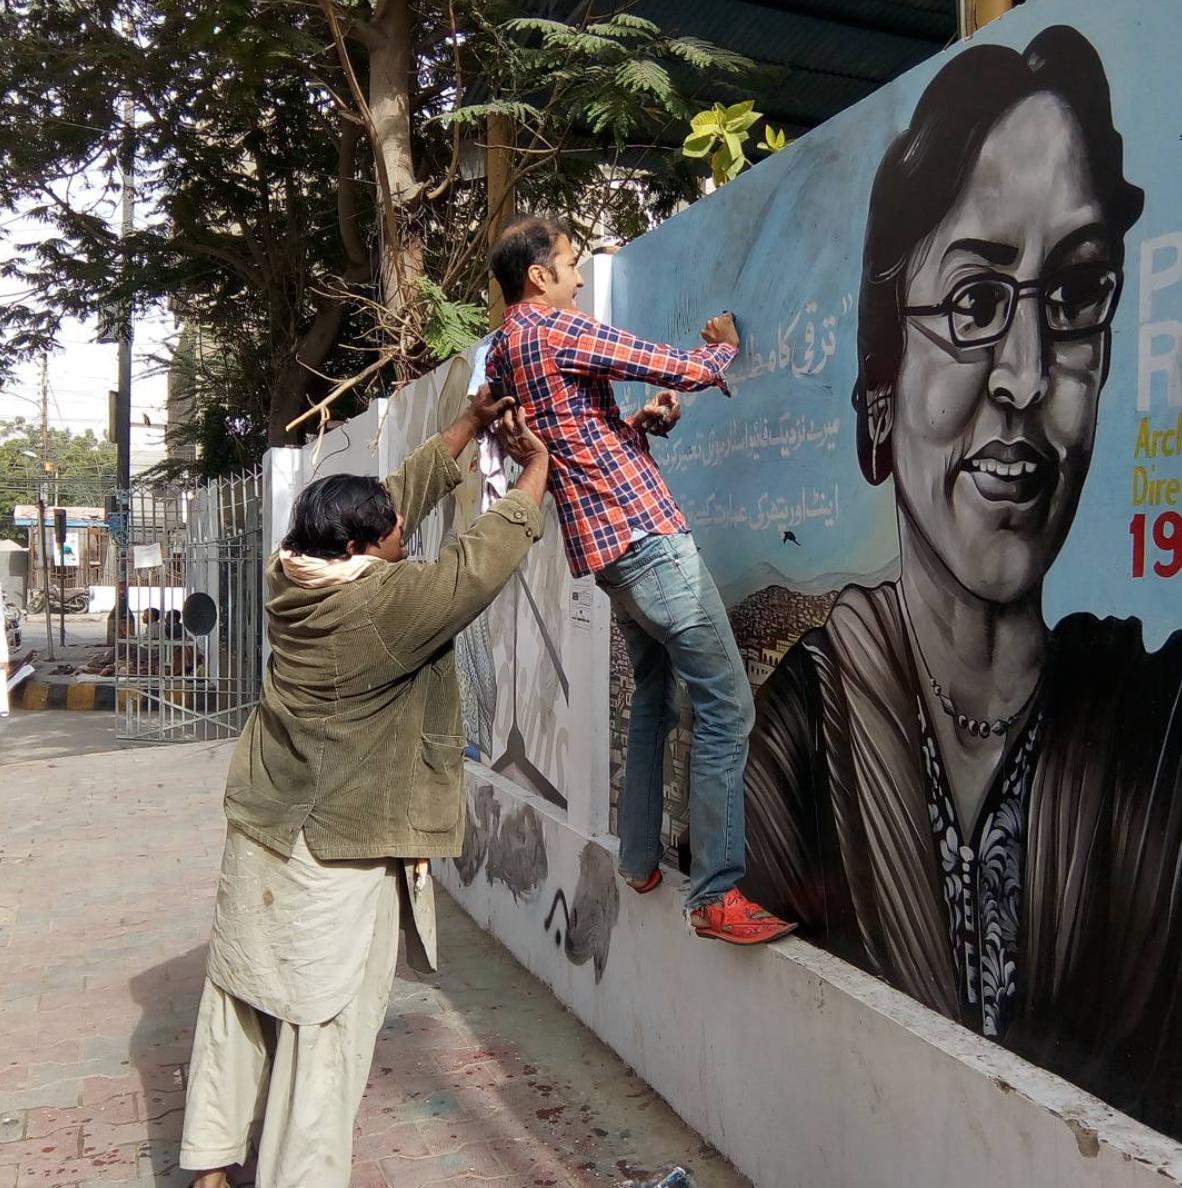 Mensenrechtenactivist Sabeen Mahmud